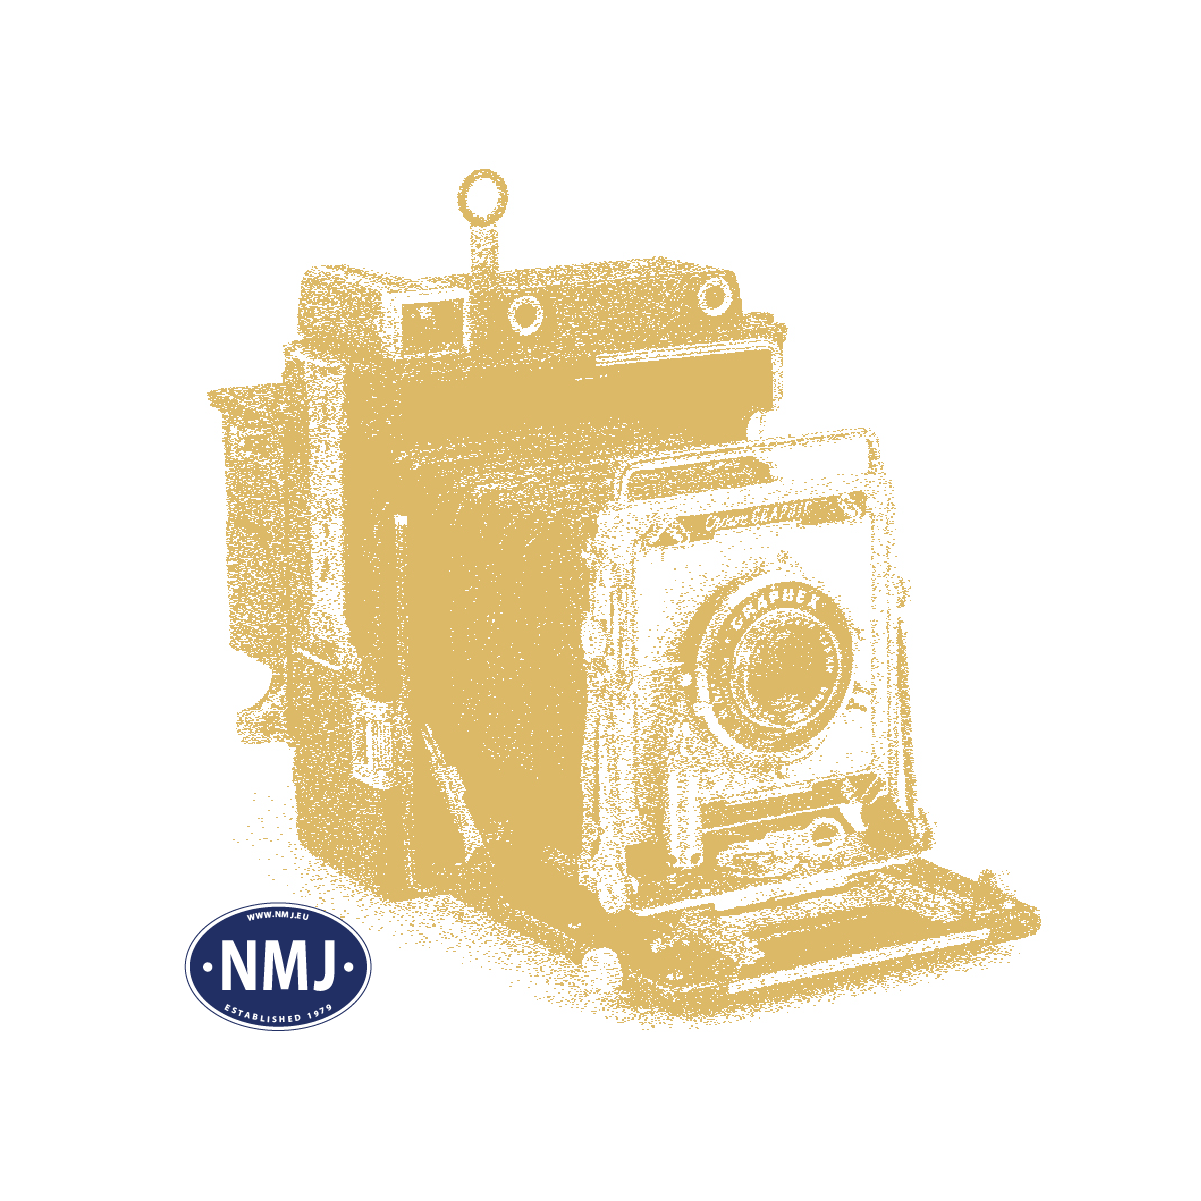 NMJE89902 - *NMJ 40 Jahre* - CargoNet Diesellokomotive CD312.001, DCC m / Sound